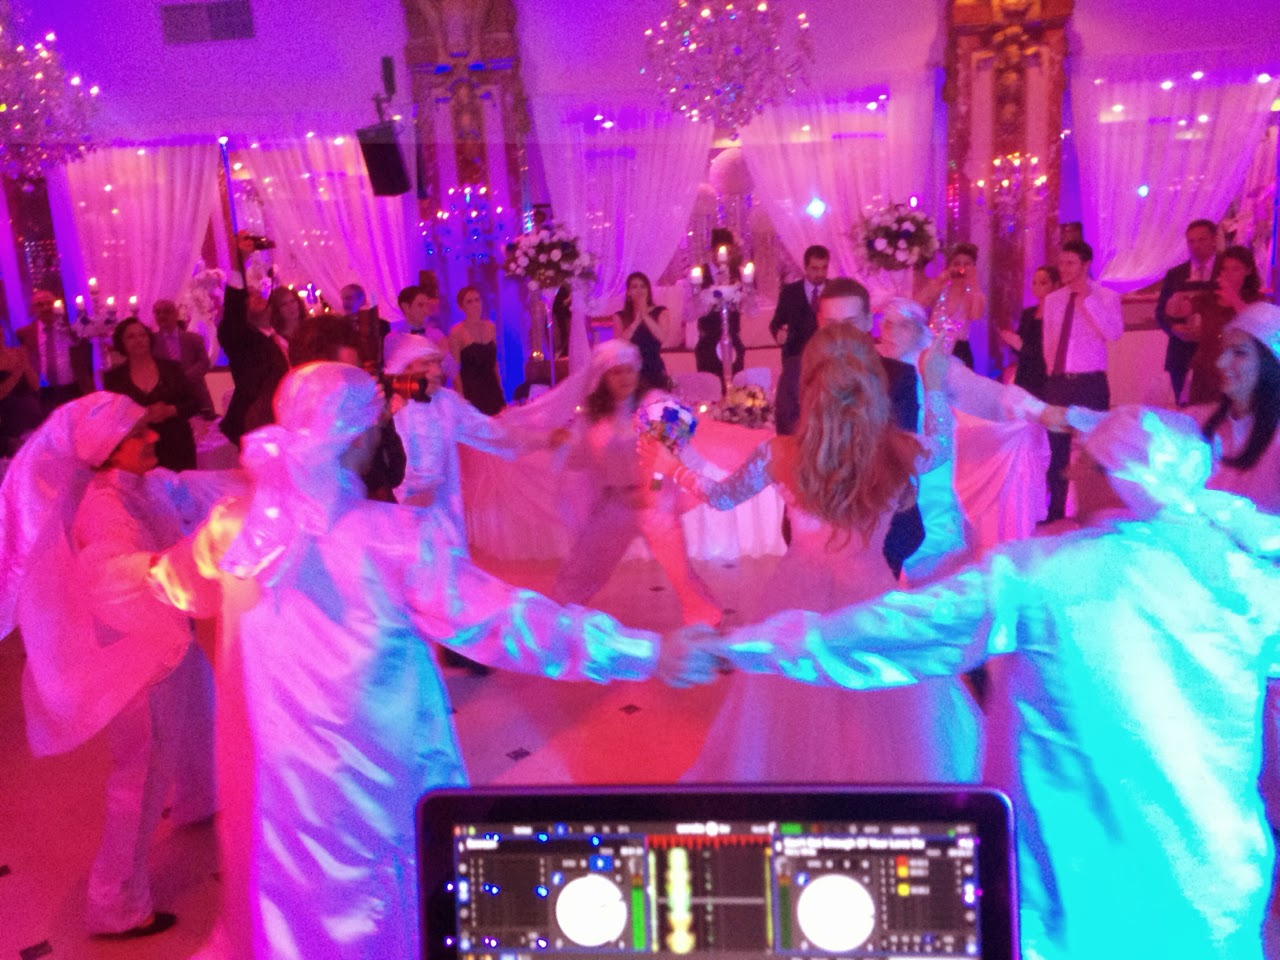 dj mariage libanais dj soiree libanaise - Dj Oriental Pour Mariage